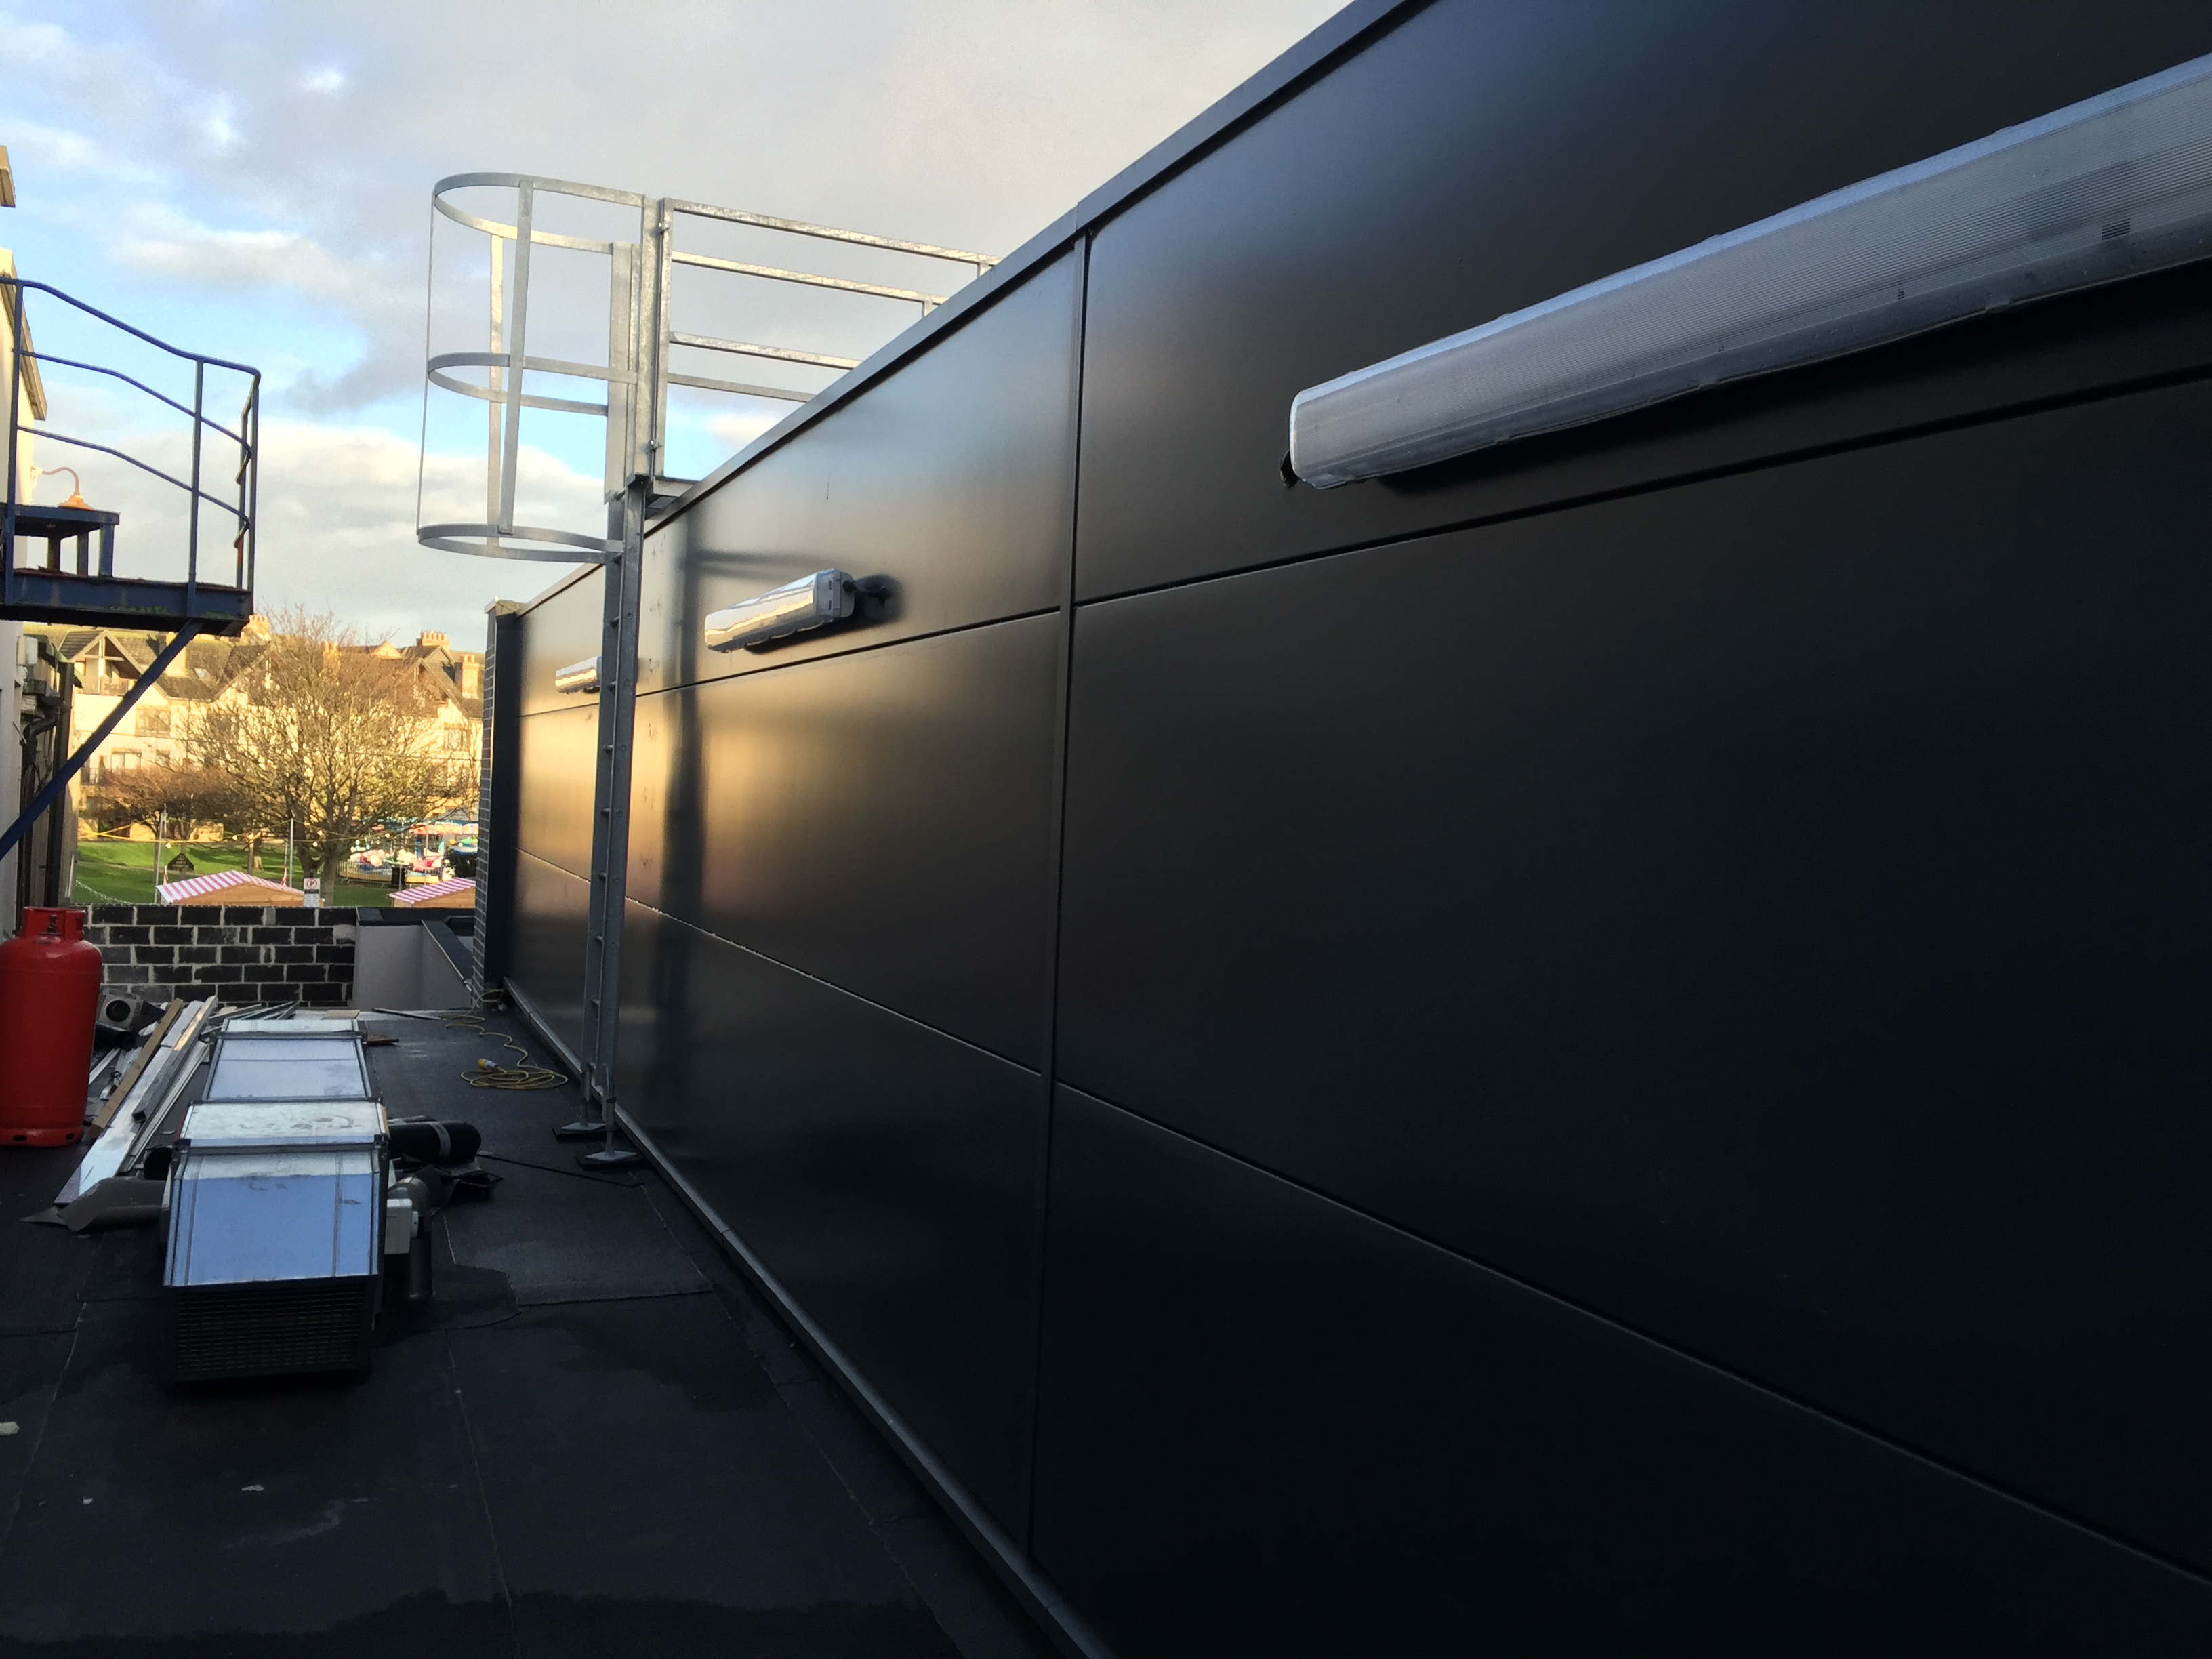 Commercial - IKO Bitumen - Donnybrook fair - Monami (4)